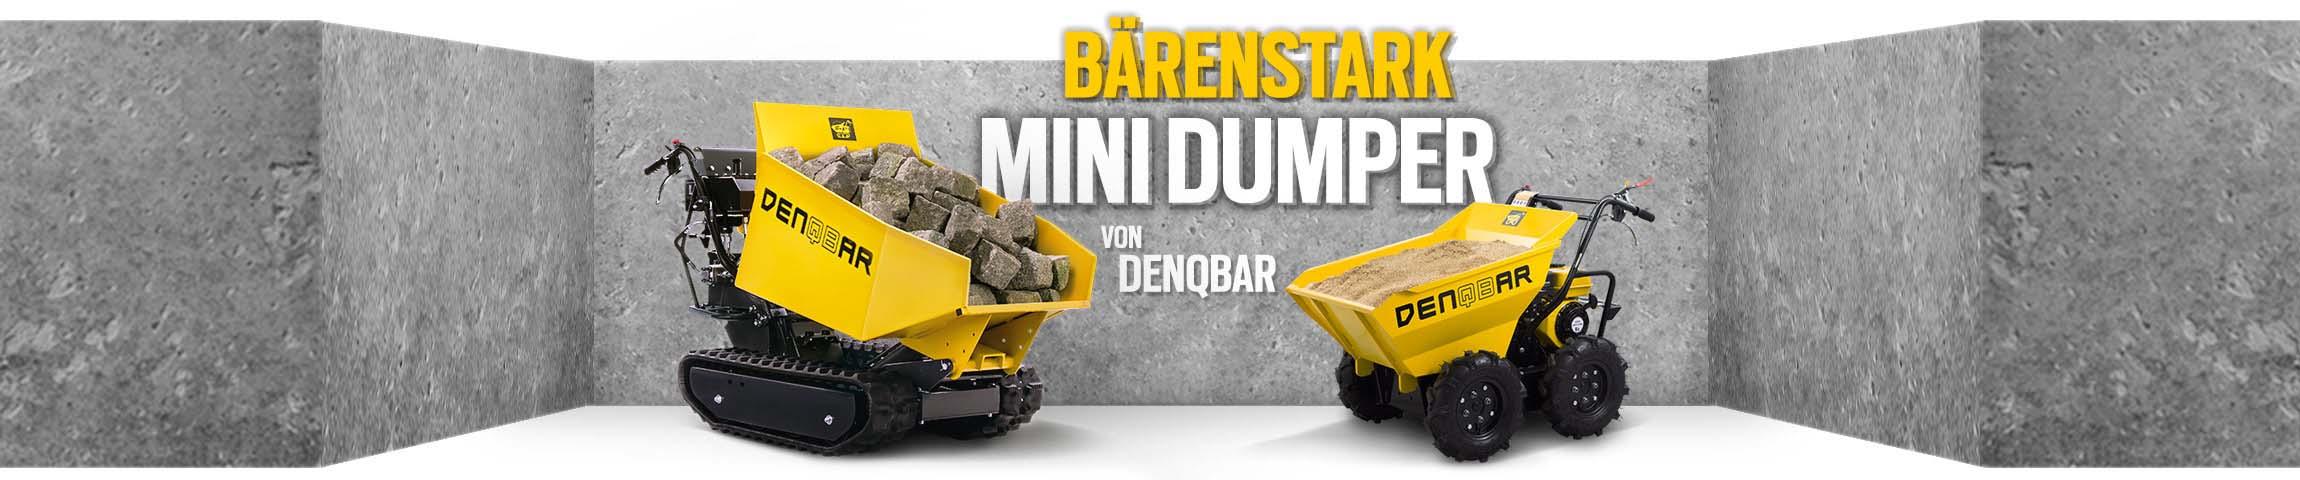 Mini Dumper